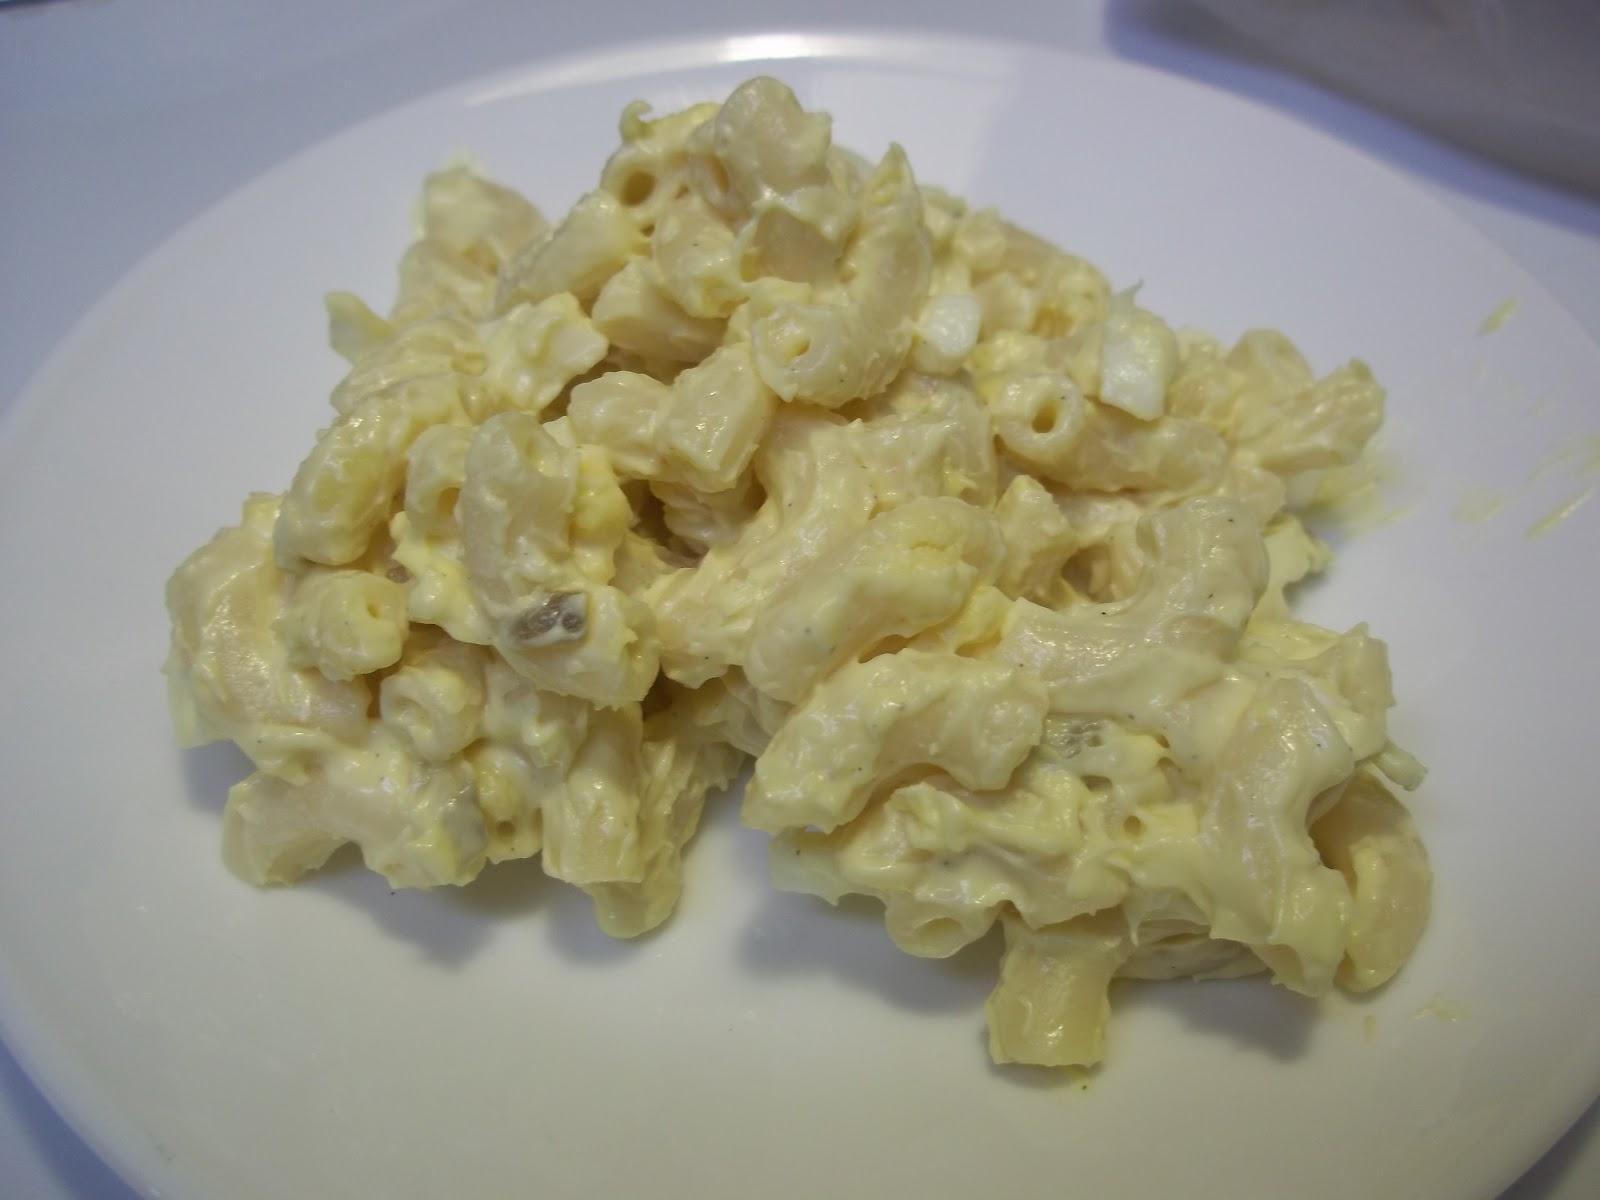 Easy Egg Salad For Easter Egg Overload Recipes — Dishmaps